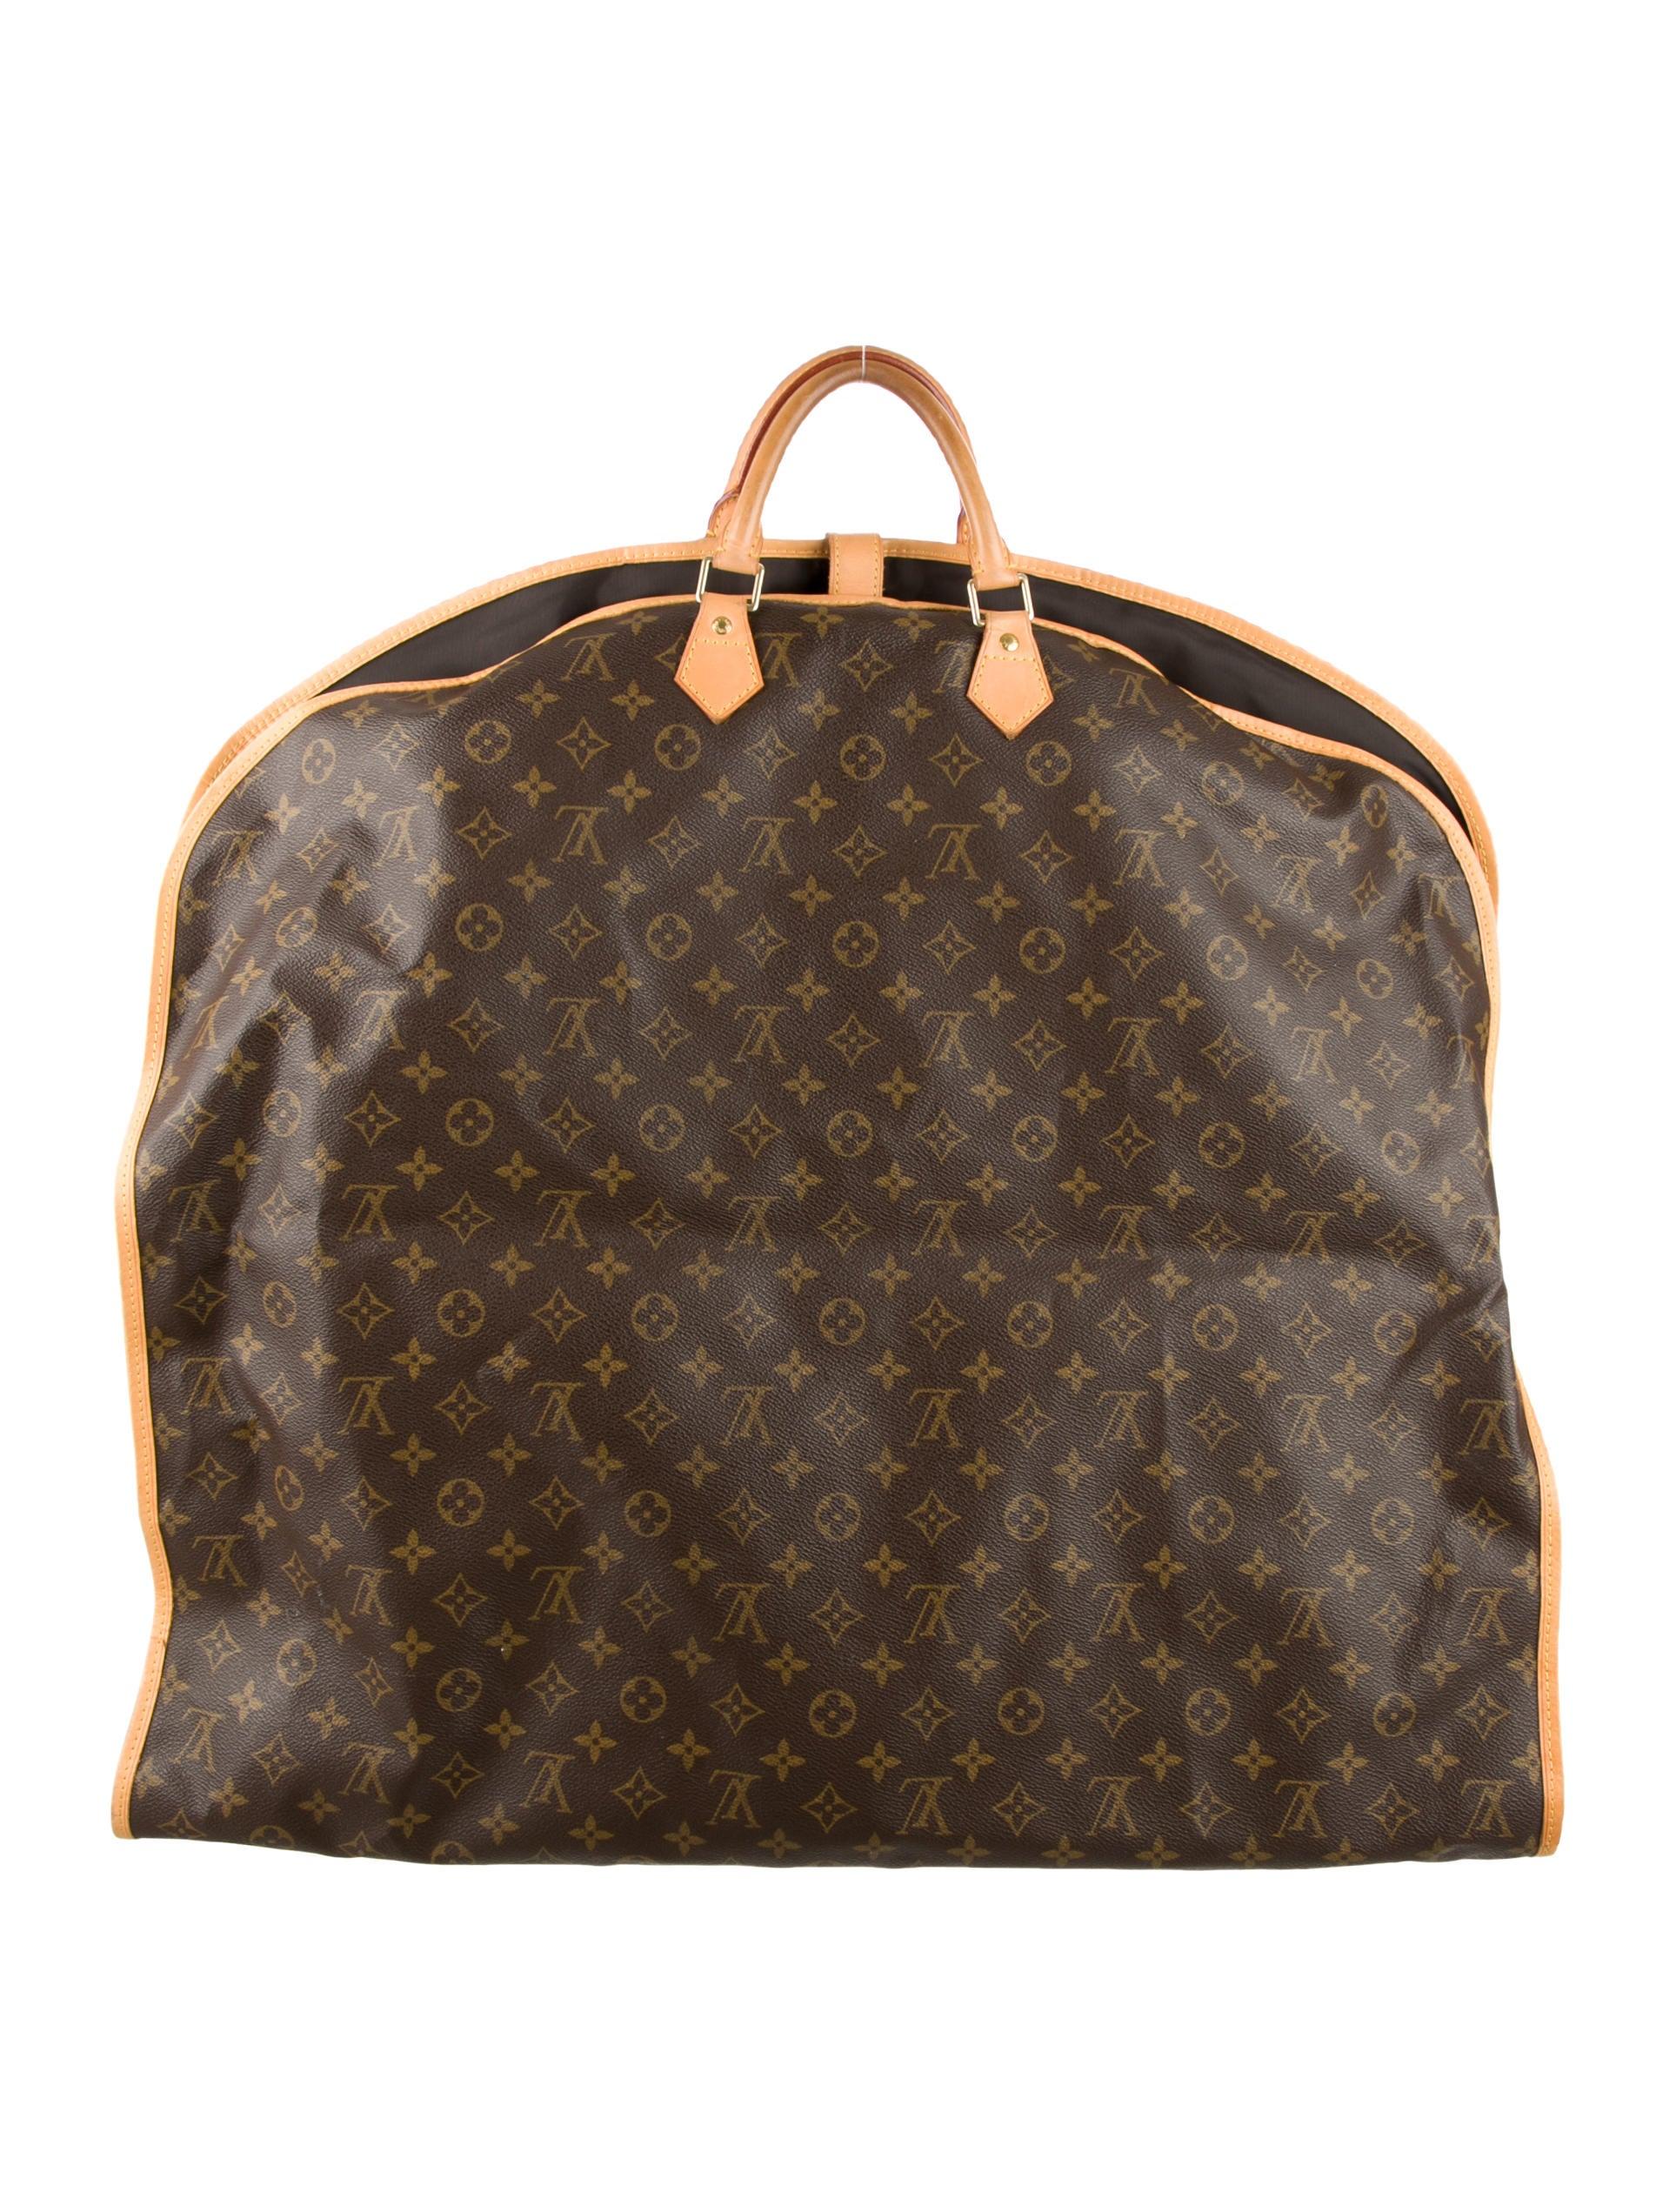 Louis Vuitton Monogram Garment Cover Bags Lou73274